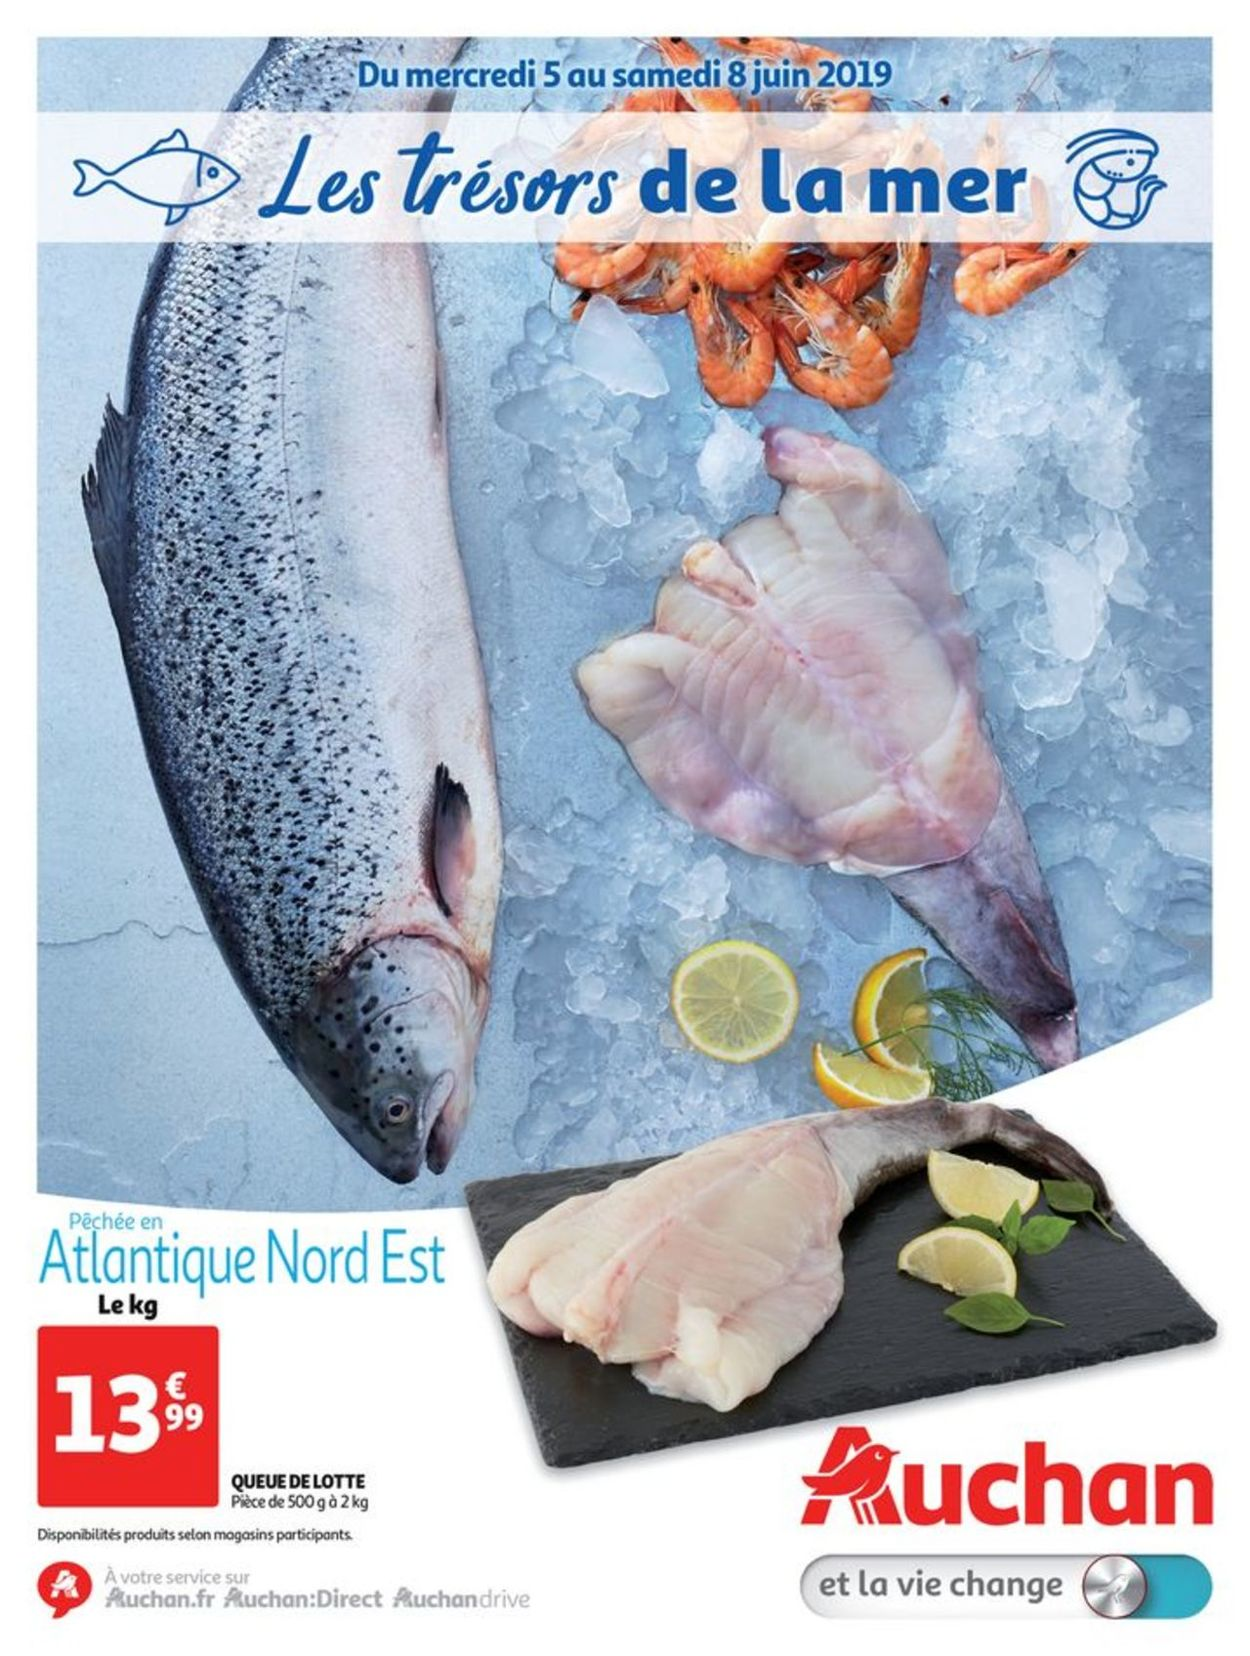 Auchan Catalogue - 05.06-08.06.2019